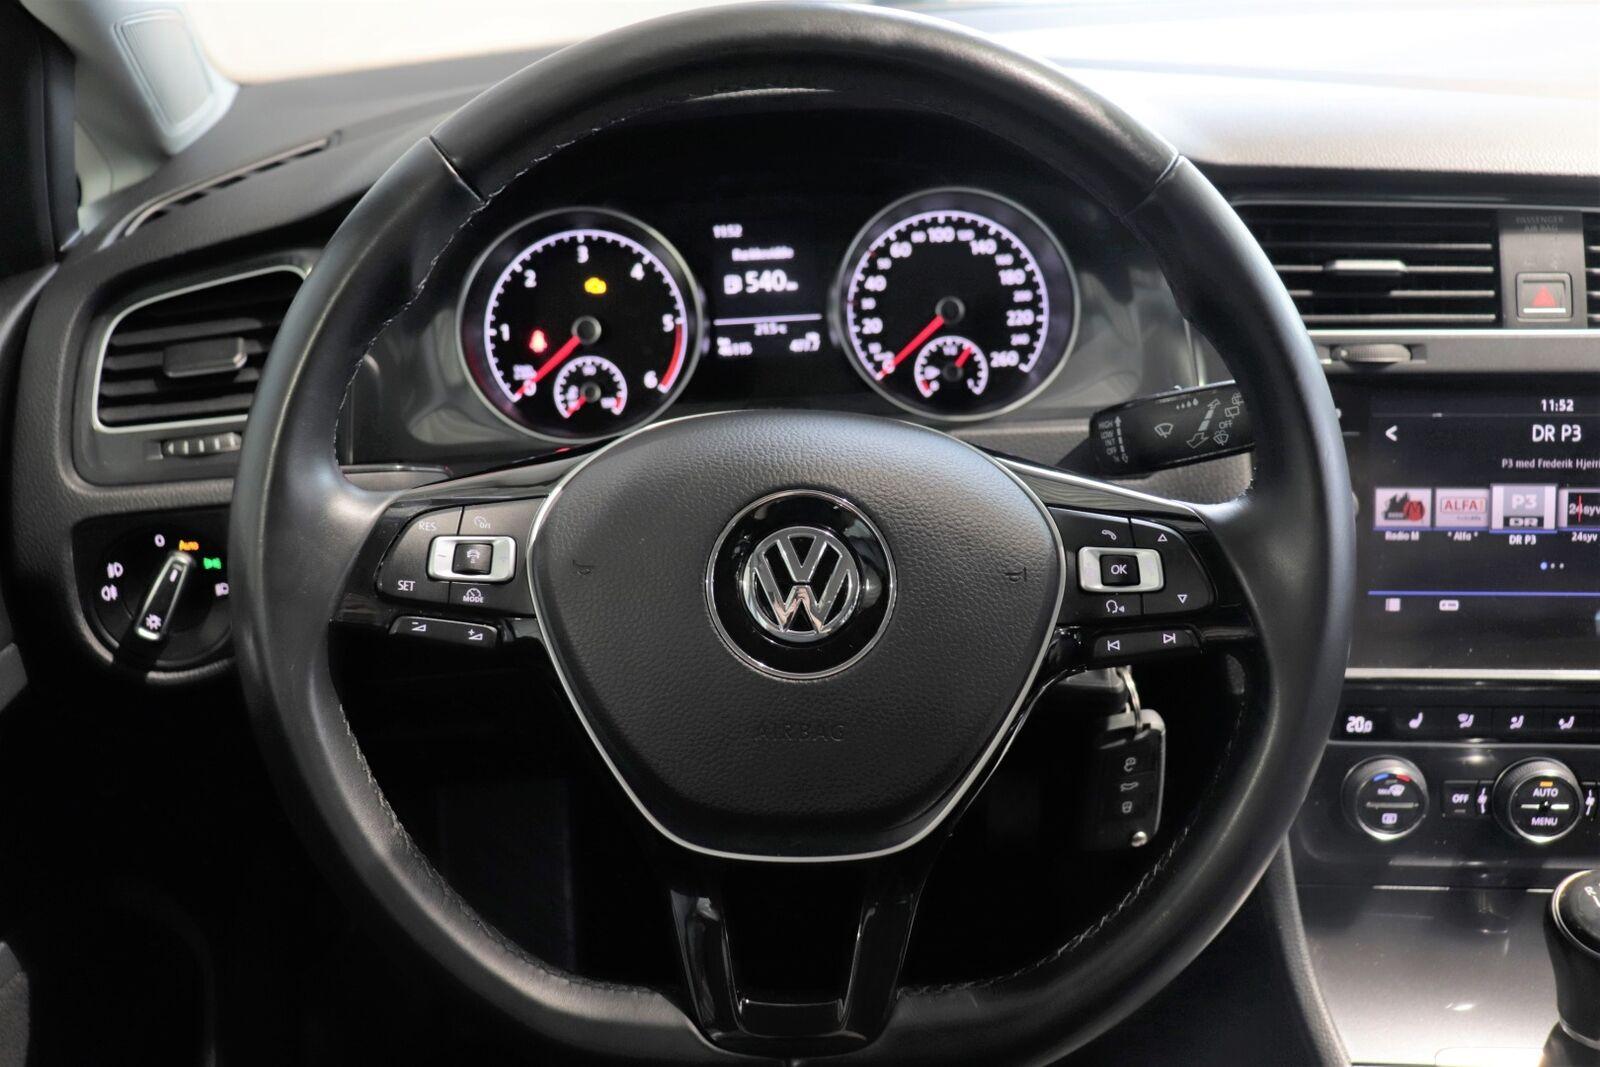 VW Golf VII TDi 115 Comfortl. Variant